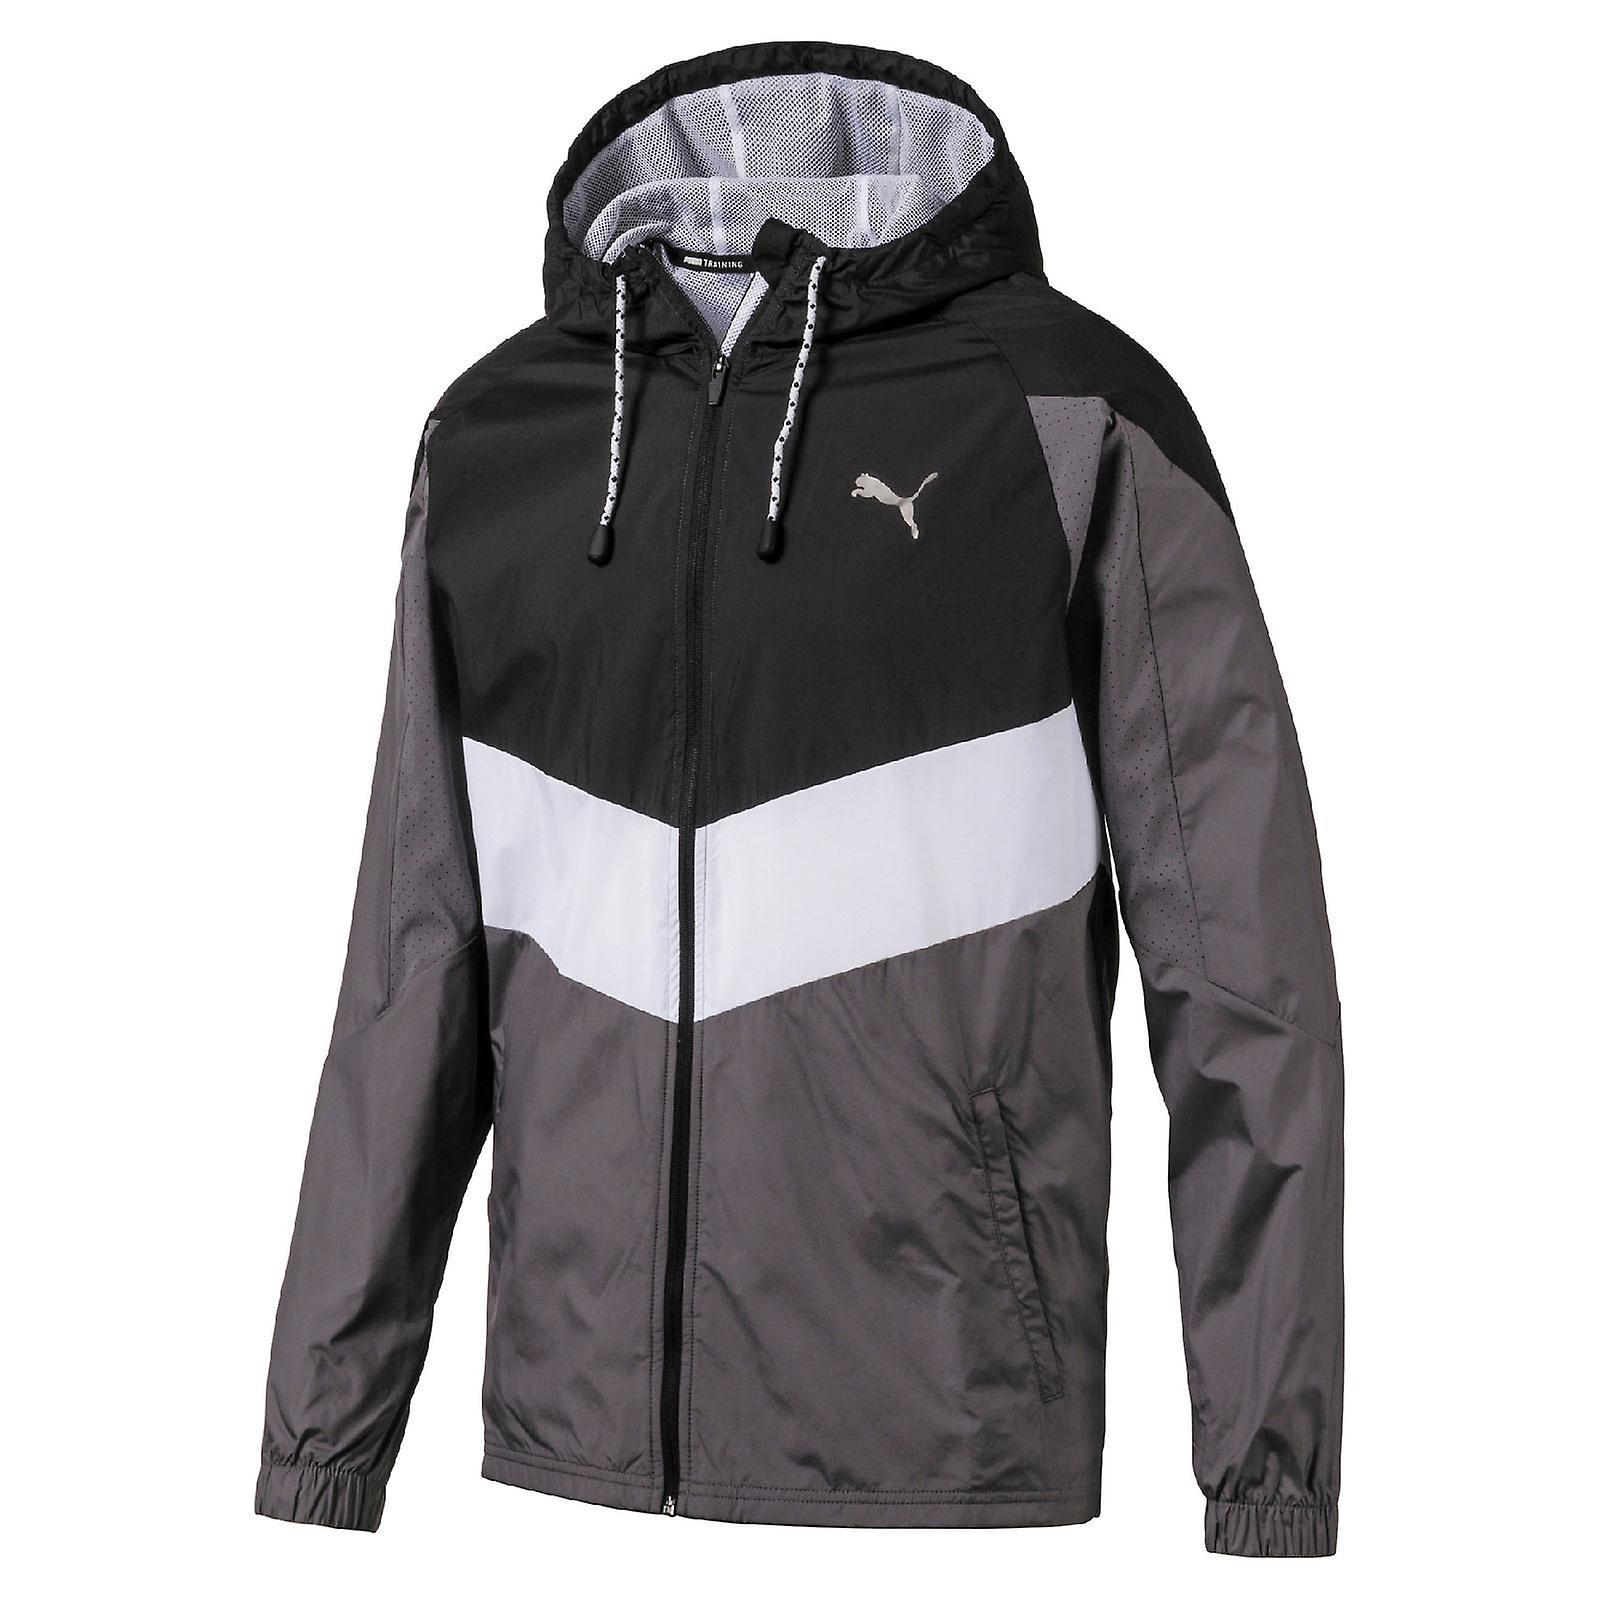 Puma Reactive Woven Mens Running Fitness Training Jacket Black/Grey